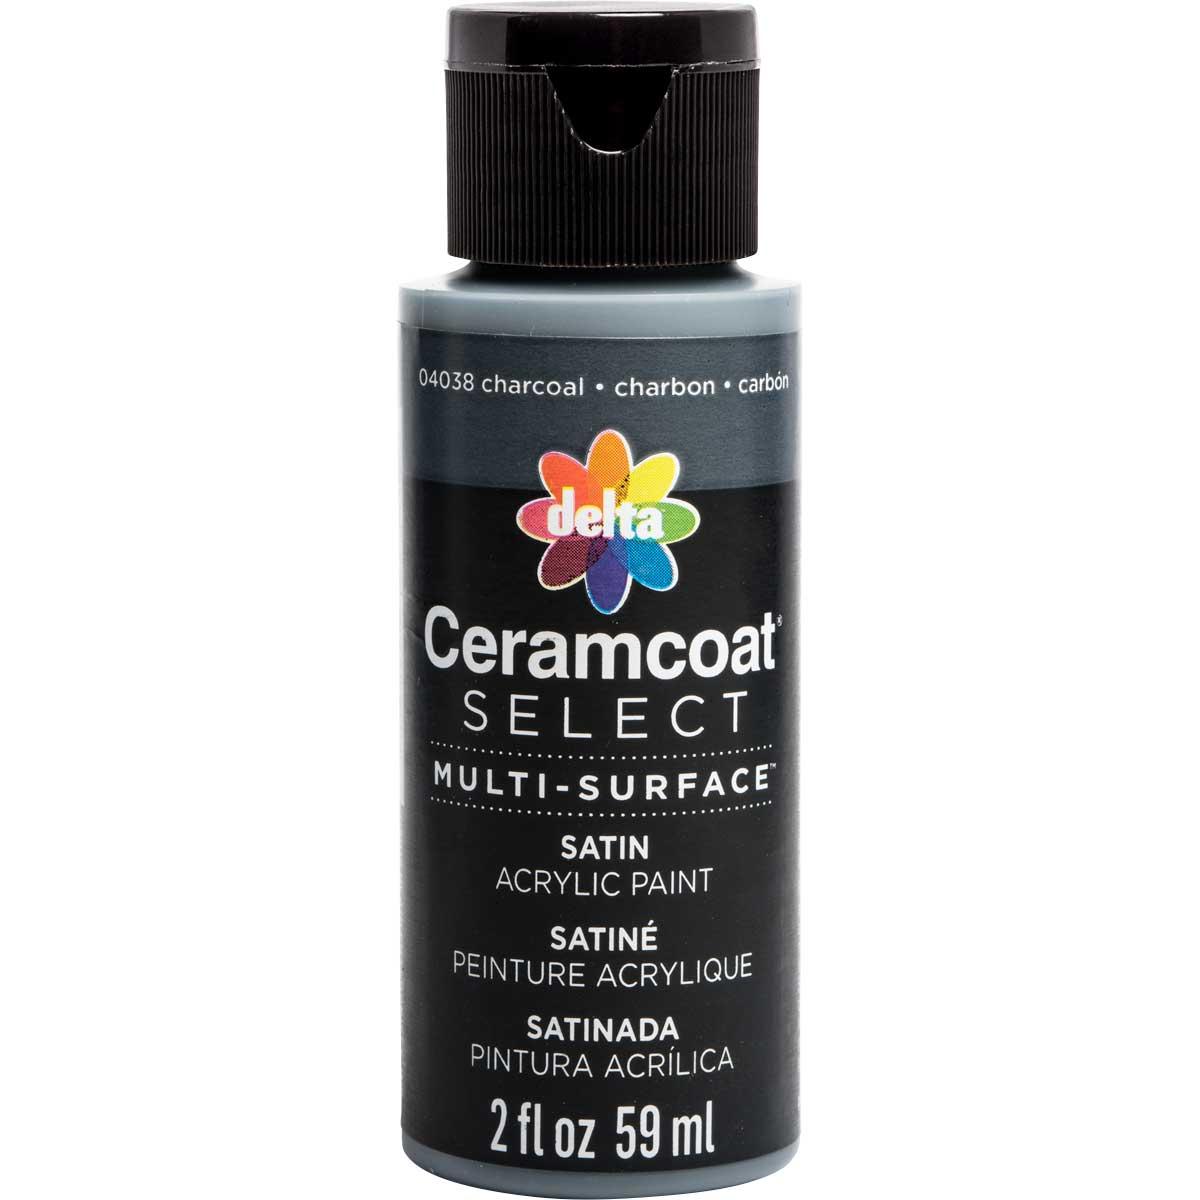 Delta Ceramcoat ® Select Multi-Surface Acrylic Paint - Satin - Charcoal, 2 oz. - 04038